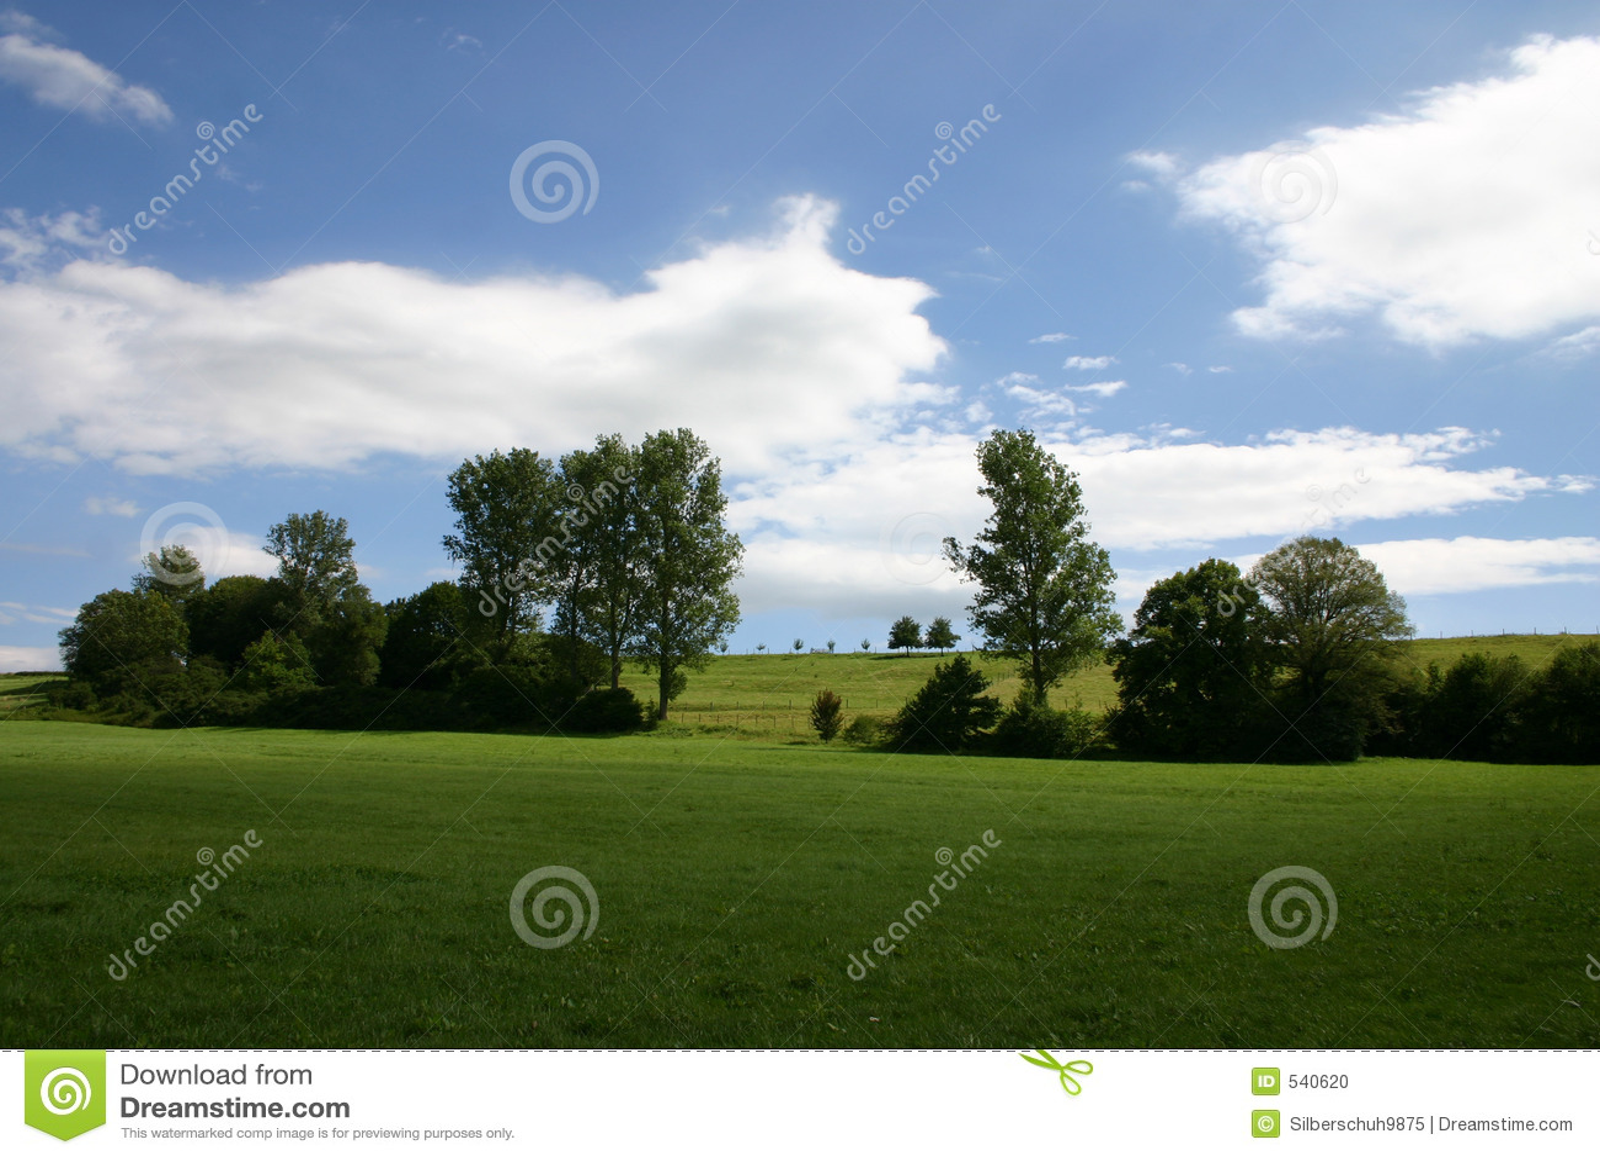 Download 横向夏天 库存照片. 图片 包括有 草甸, 欧洲, 农村, 国家(地区), 重新创建, 云彩, 视图, 放松 - 540620